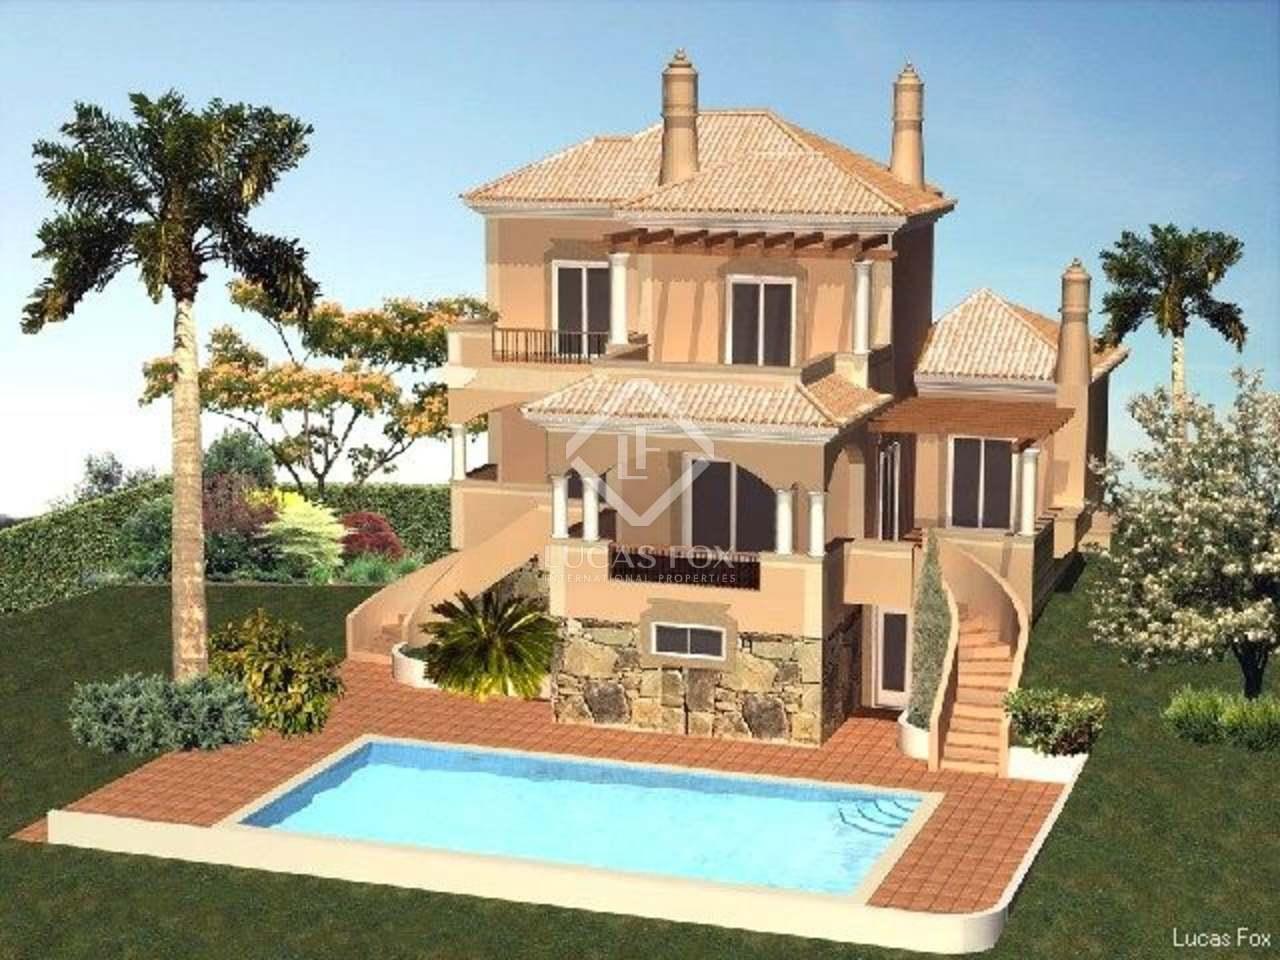 274m haus villa zum verkauf in algarve portugal. Black Bedroom Furniture Sets. Home Design Ideas